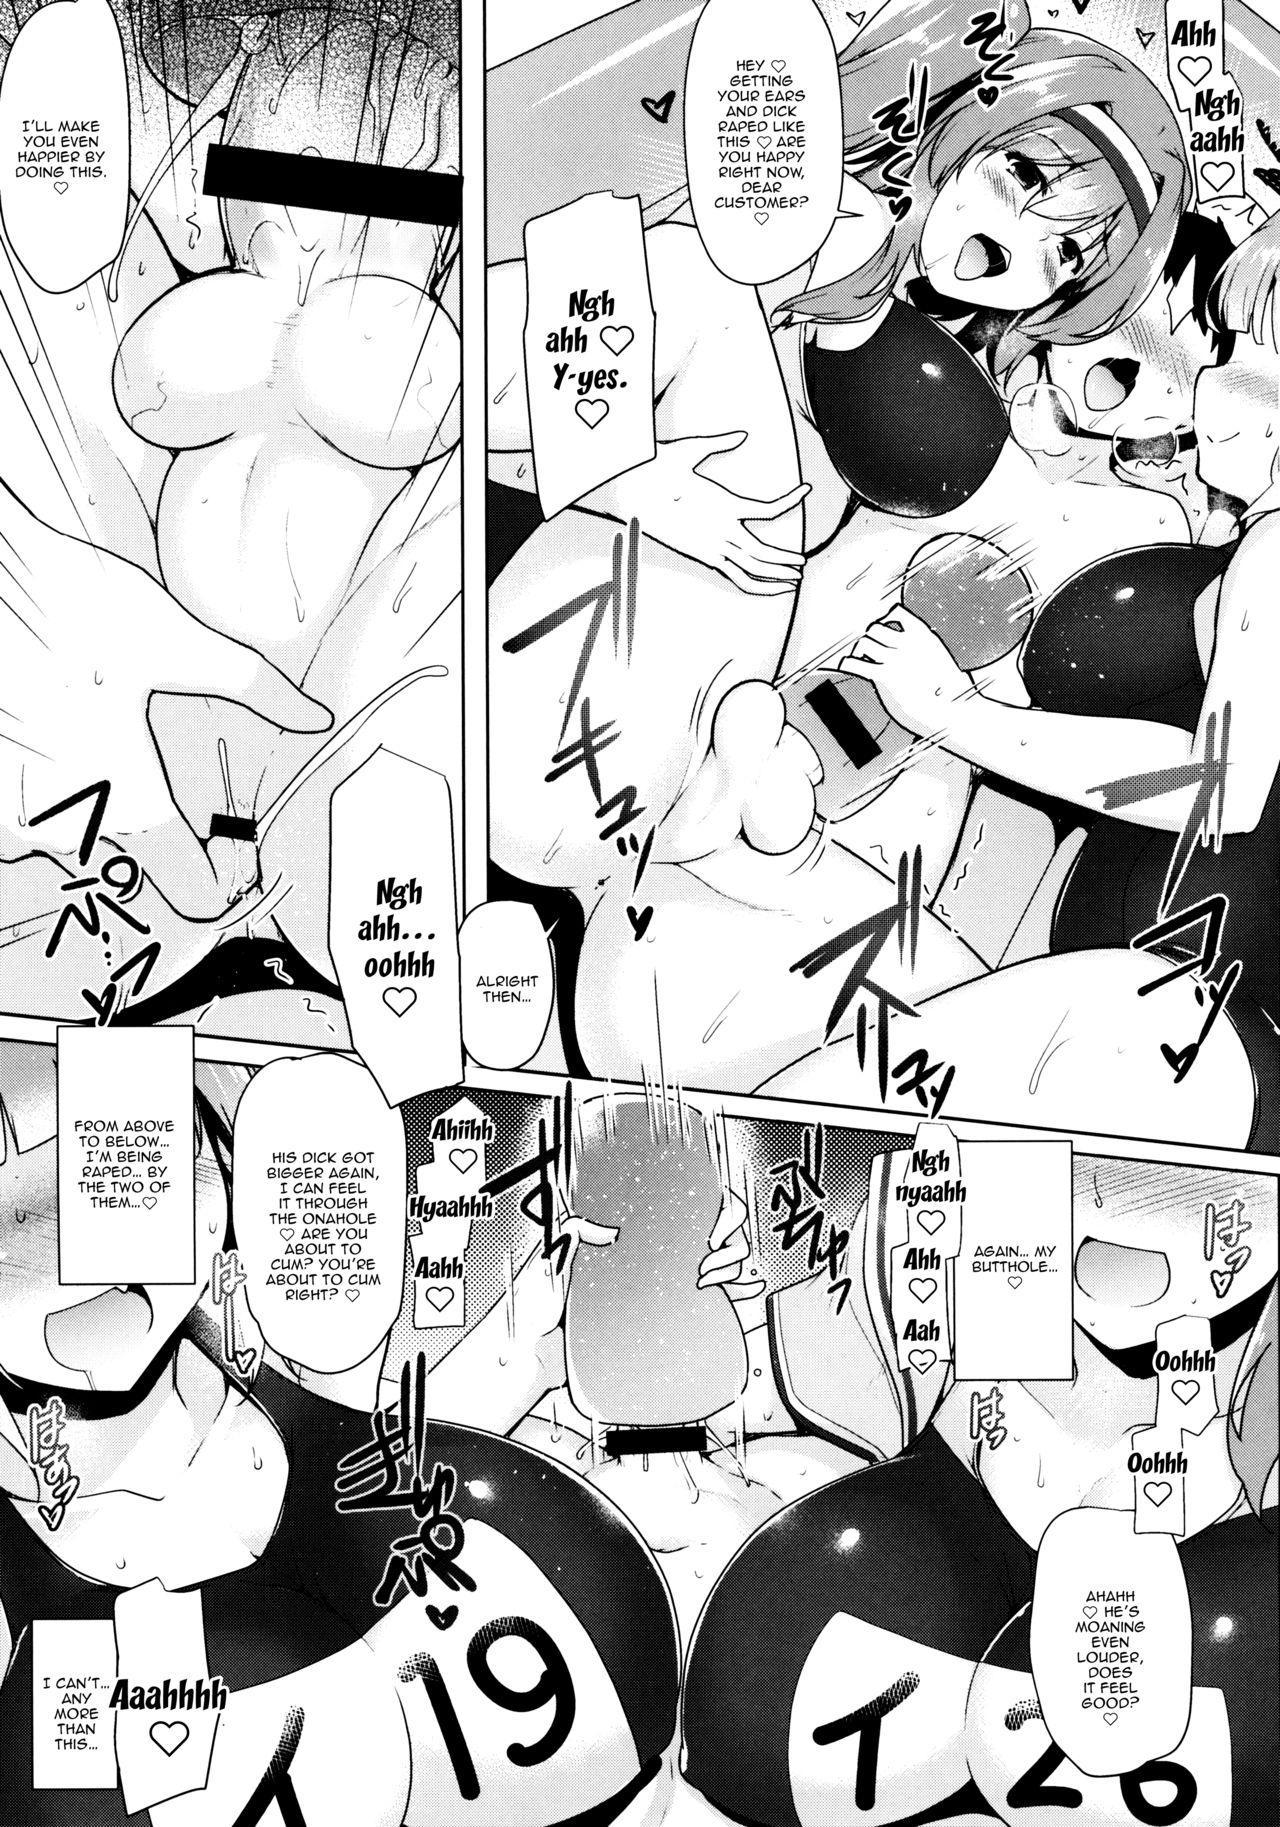 (C93) [C.R's NEST (C.R)] Kankourei Gaiden: Kaishun Men's Massage I-*** Act.2 | Kancolle Side Story - Rejuvinating Massage For Men - Act.2 (Kantai Collection -KanColle-) [English] {Doujins.com} 14